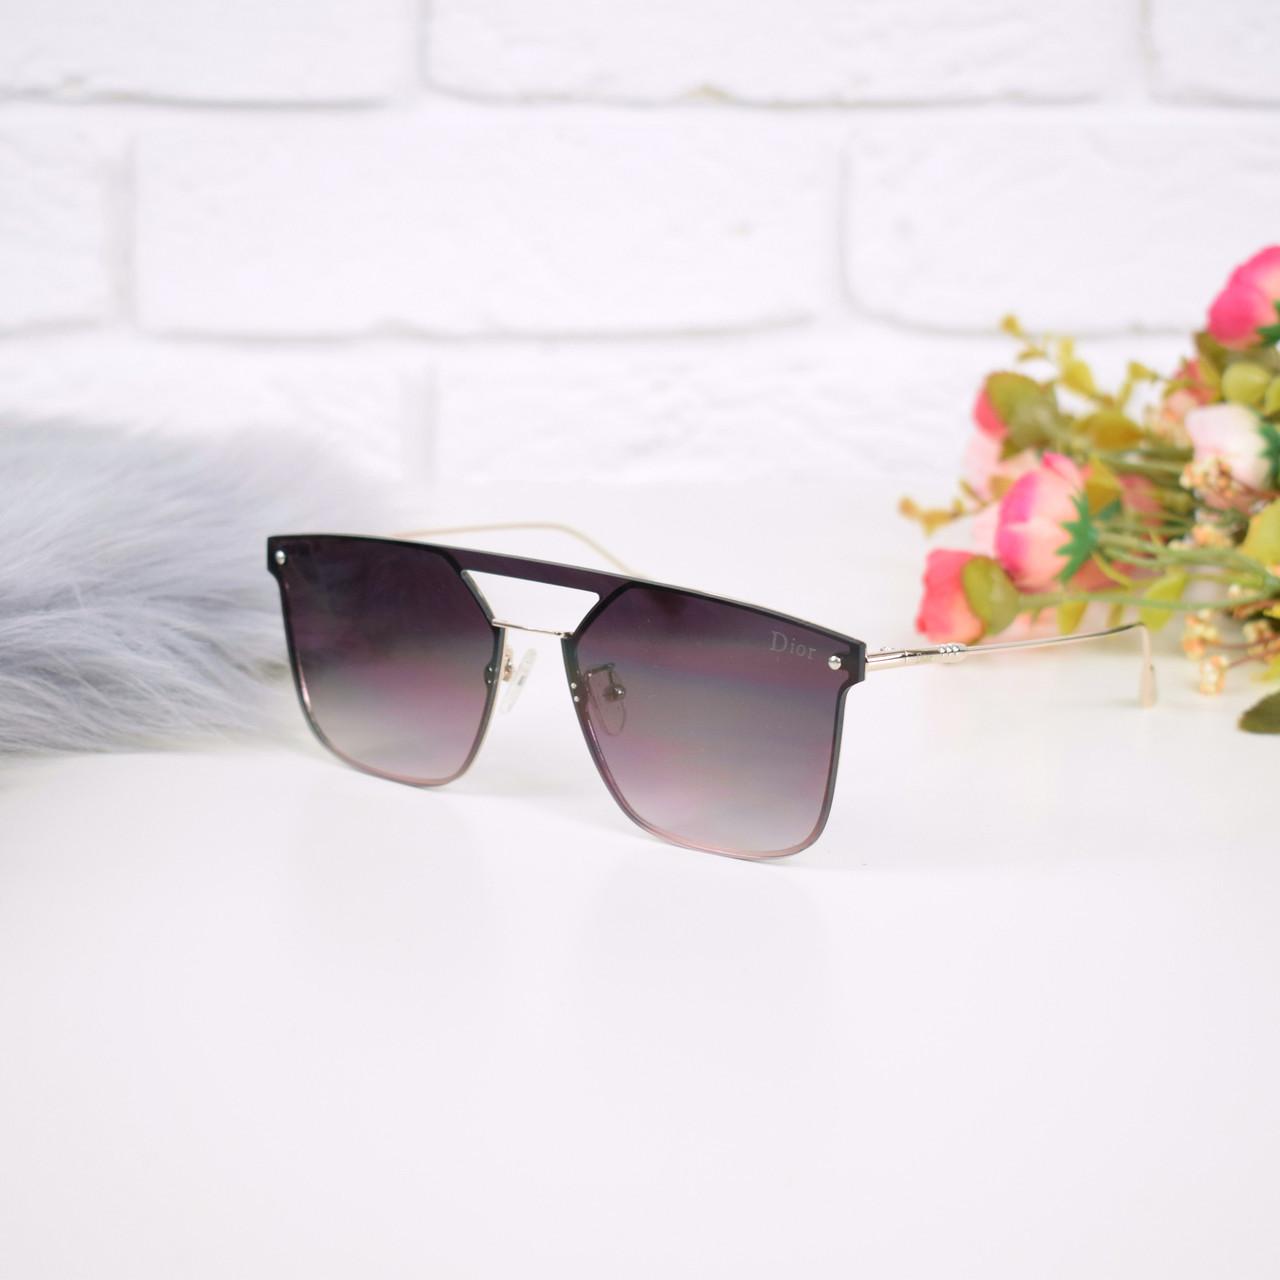 f60e5070dbec Очки женские от солнца в стиле Dior коричневые 301678, магазин очков ...